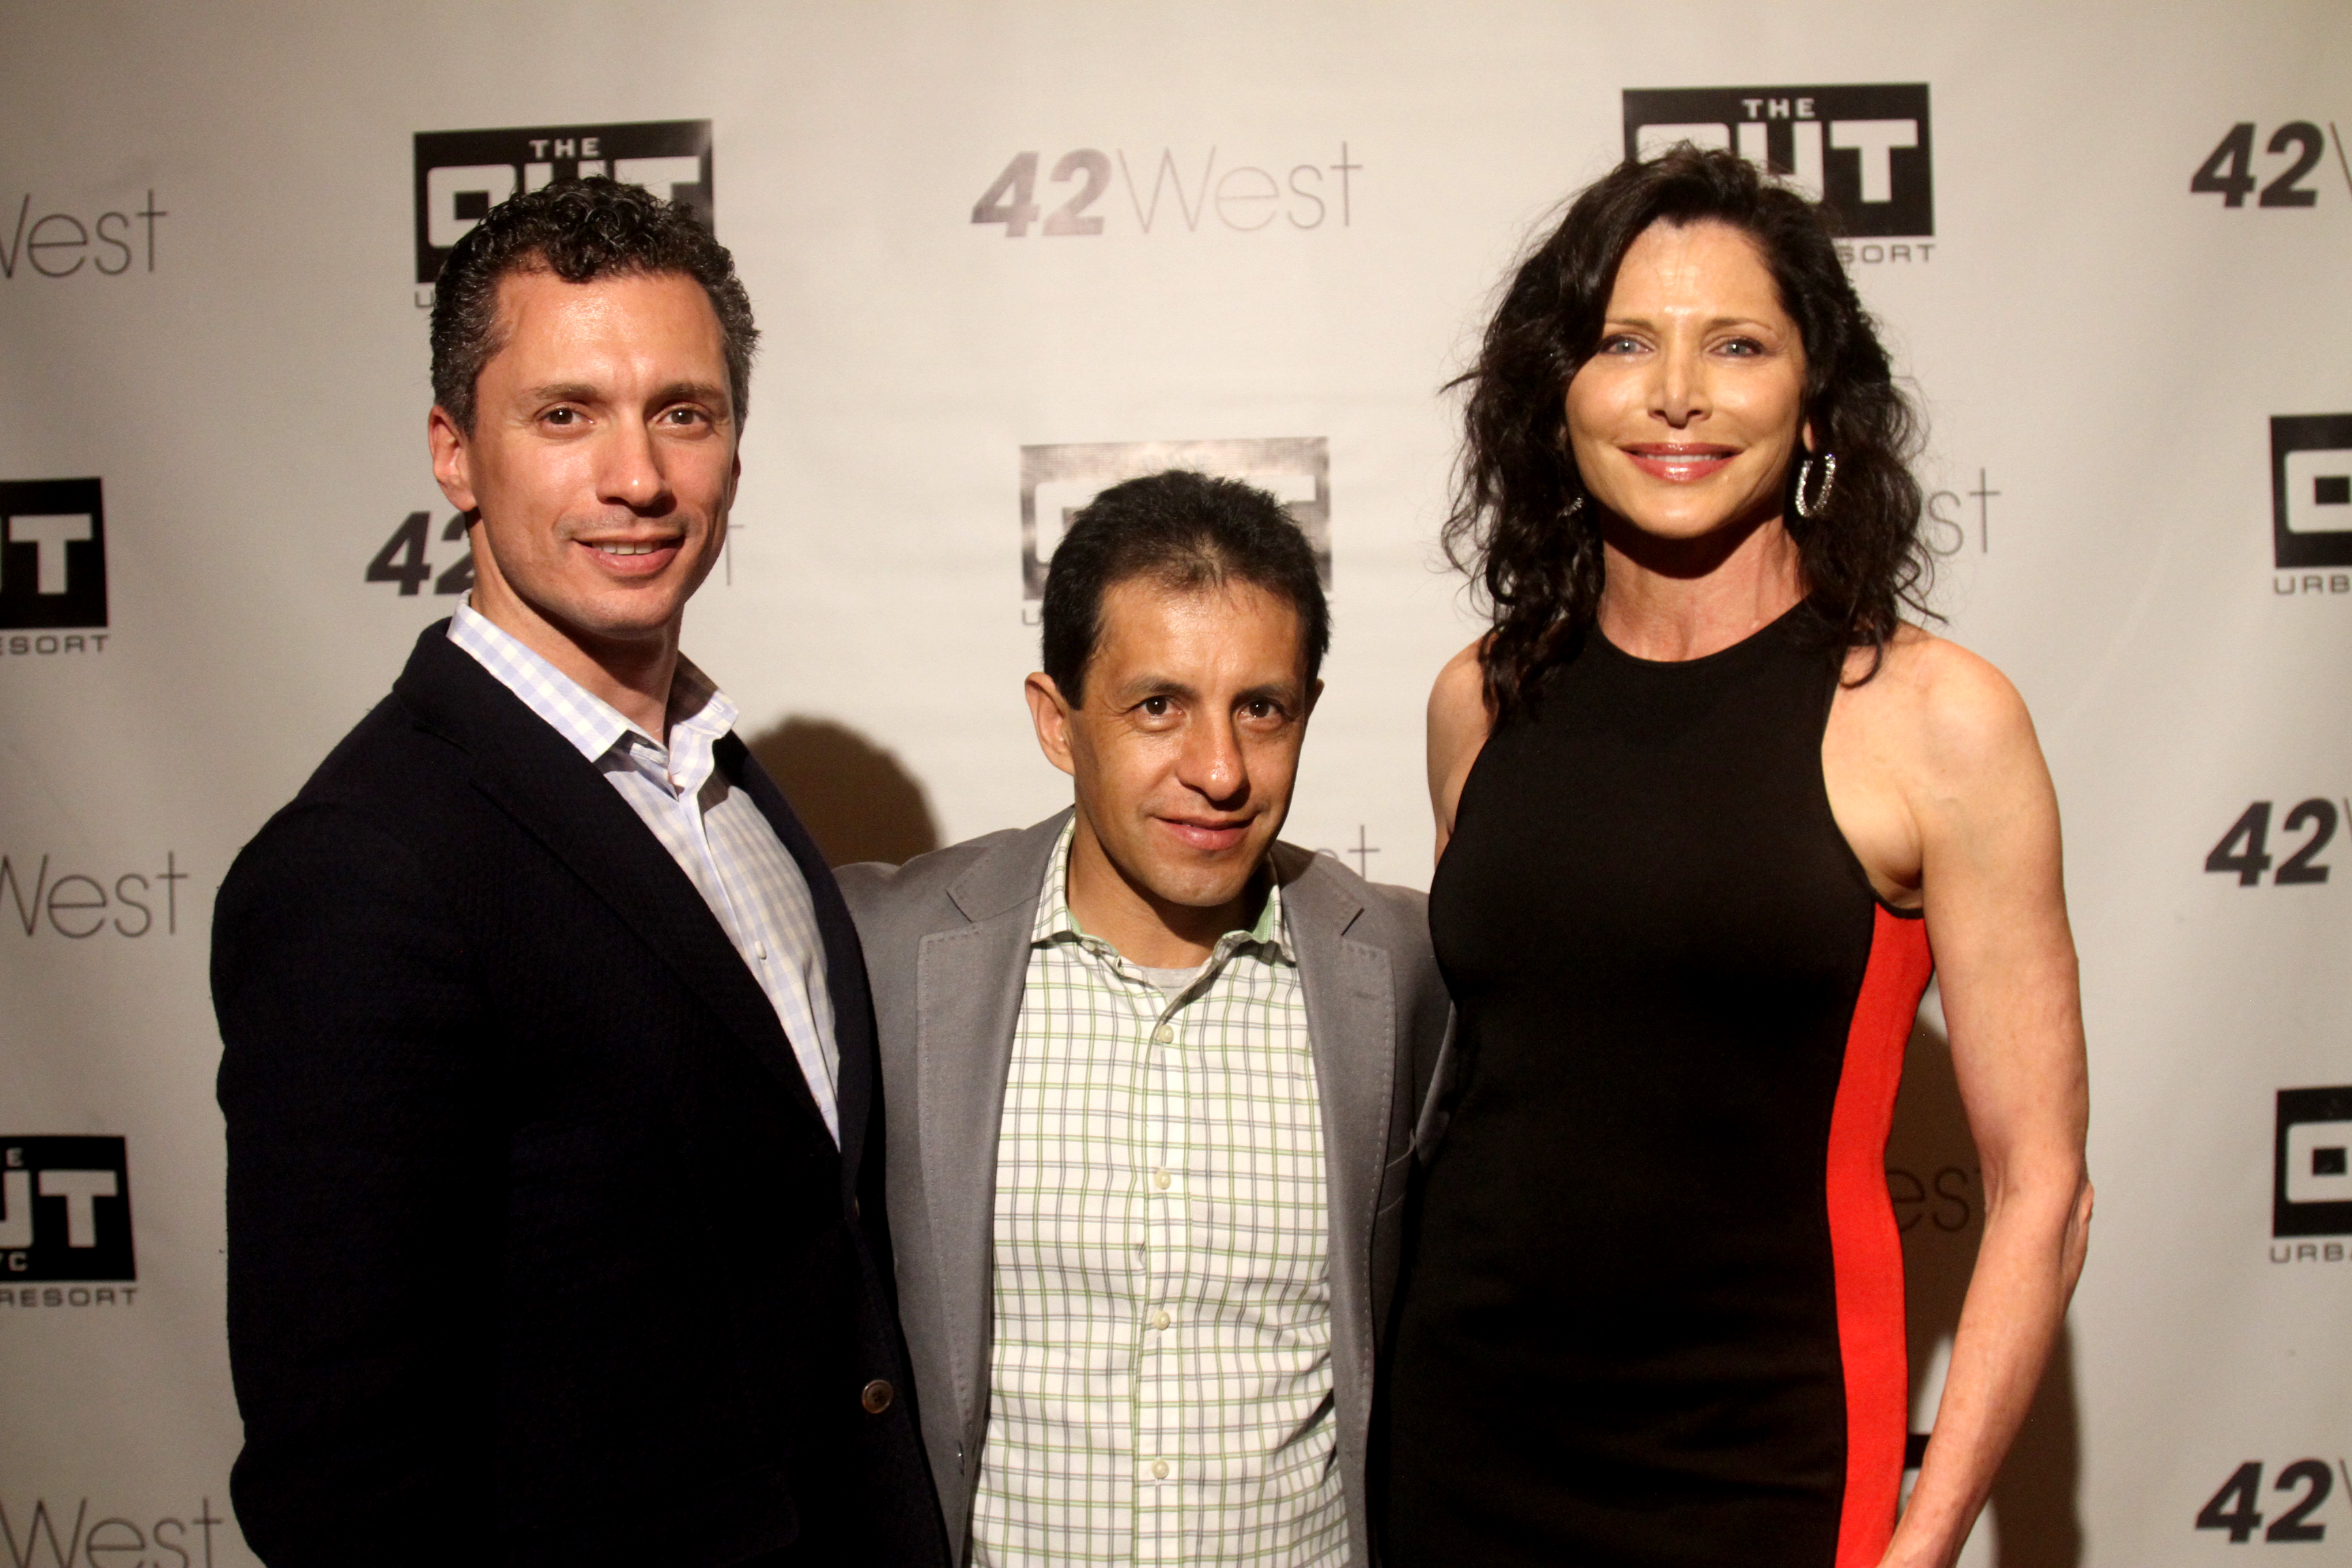 David Noto, Victor Espinoza, Sheila Rosenblum (L-R)